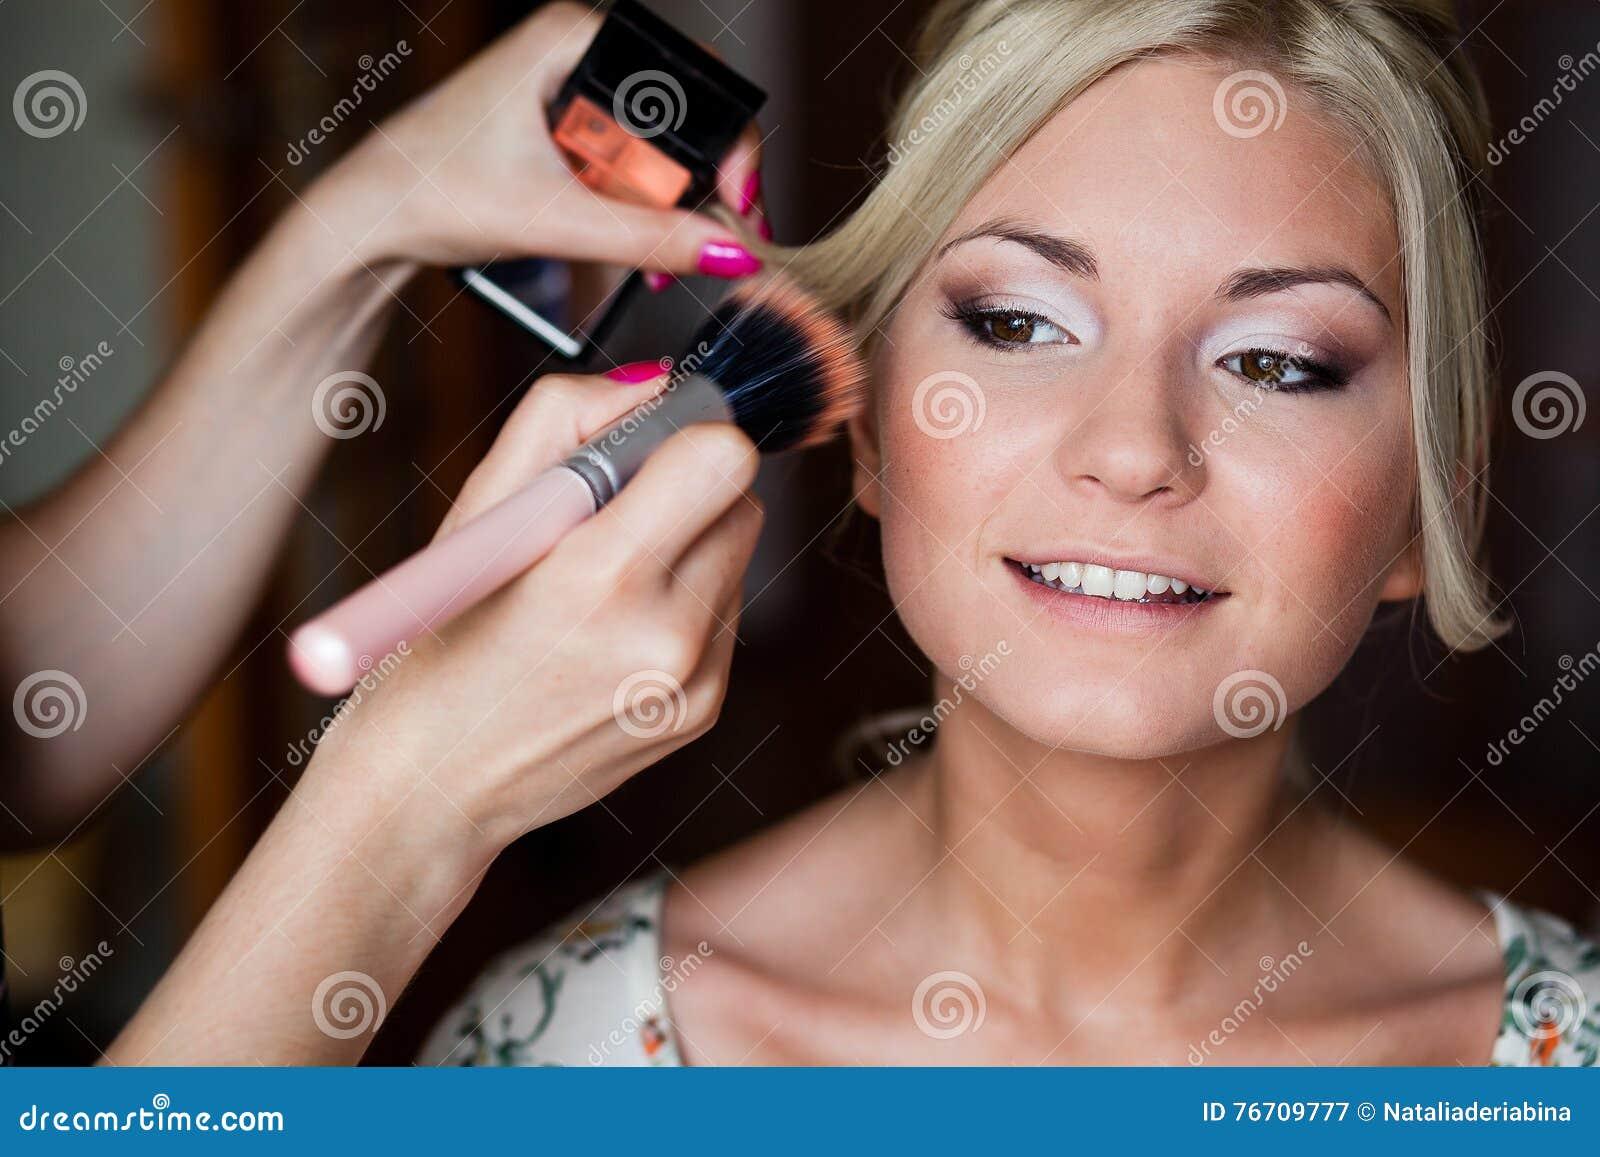 c1ff7c64f32 Ο καλλιτέχνης Makeup κάνει τη νέα όμορφη νύφη το νυφικό Makeup Στοκ ...